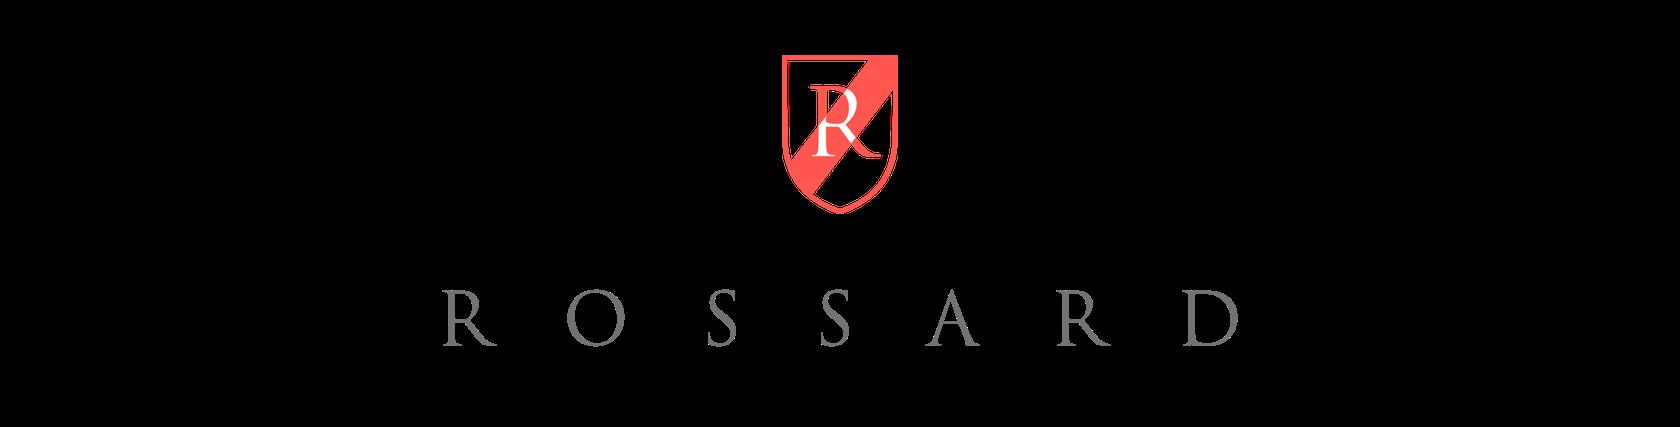 Rossard Logo.png